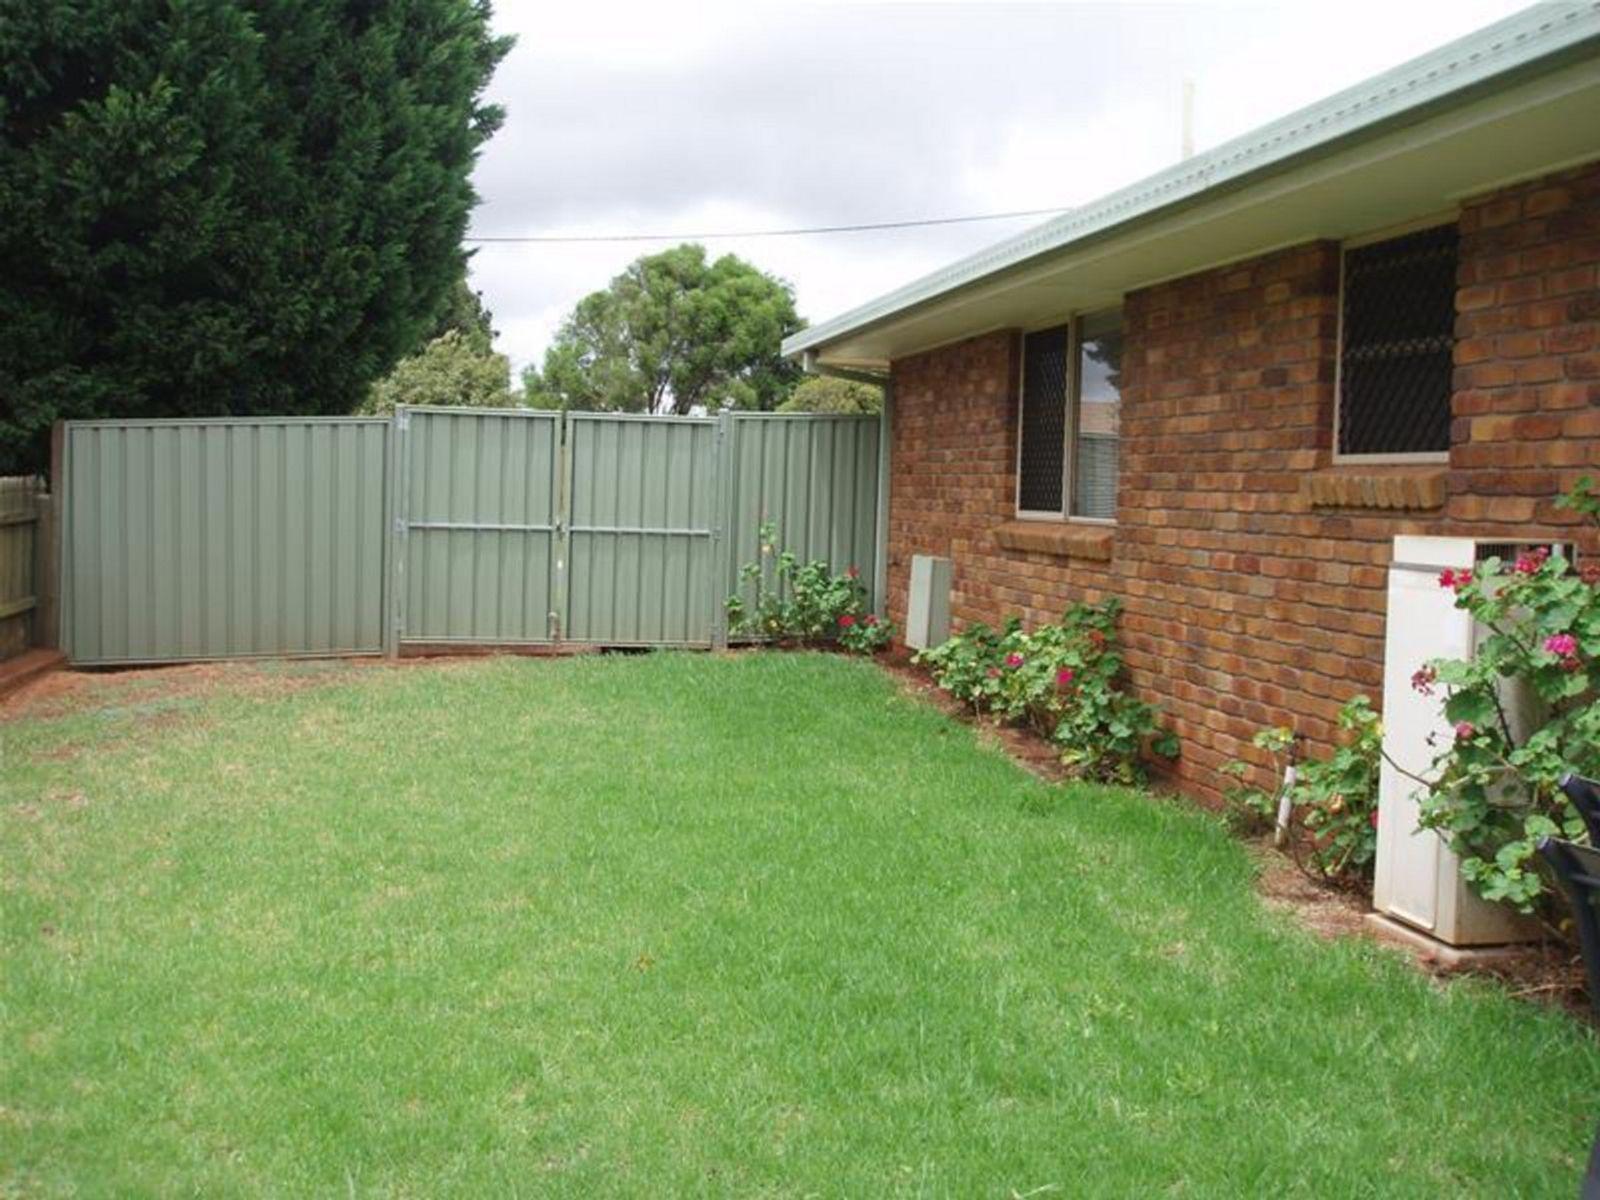 2/6 Kuhn Street, Kearneys Spring, QLD 4350